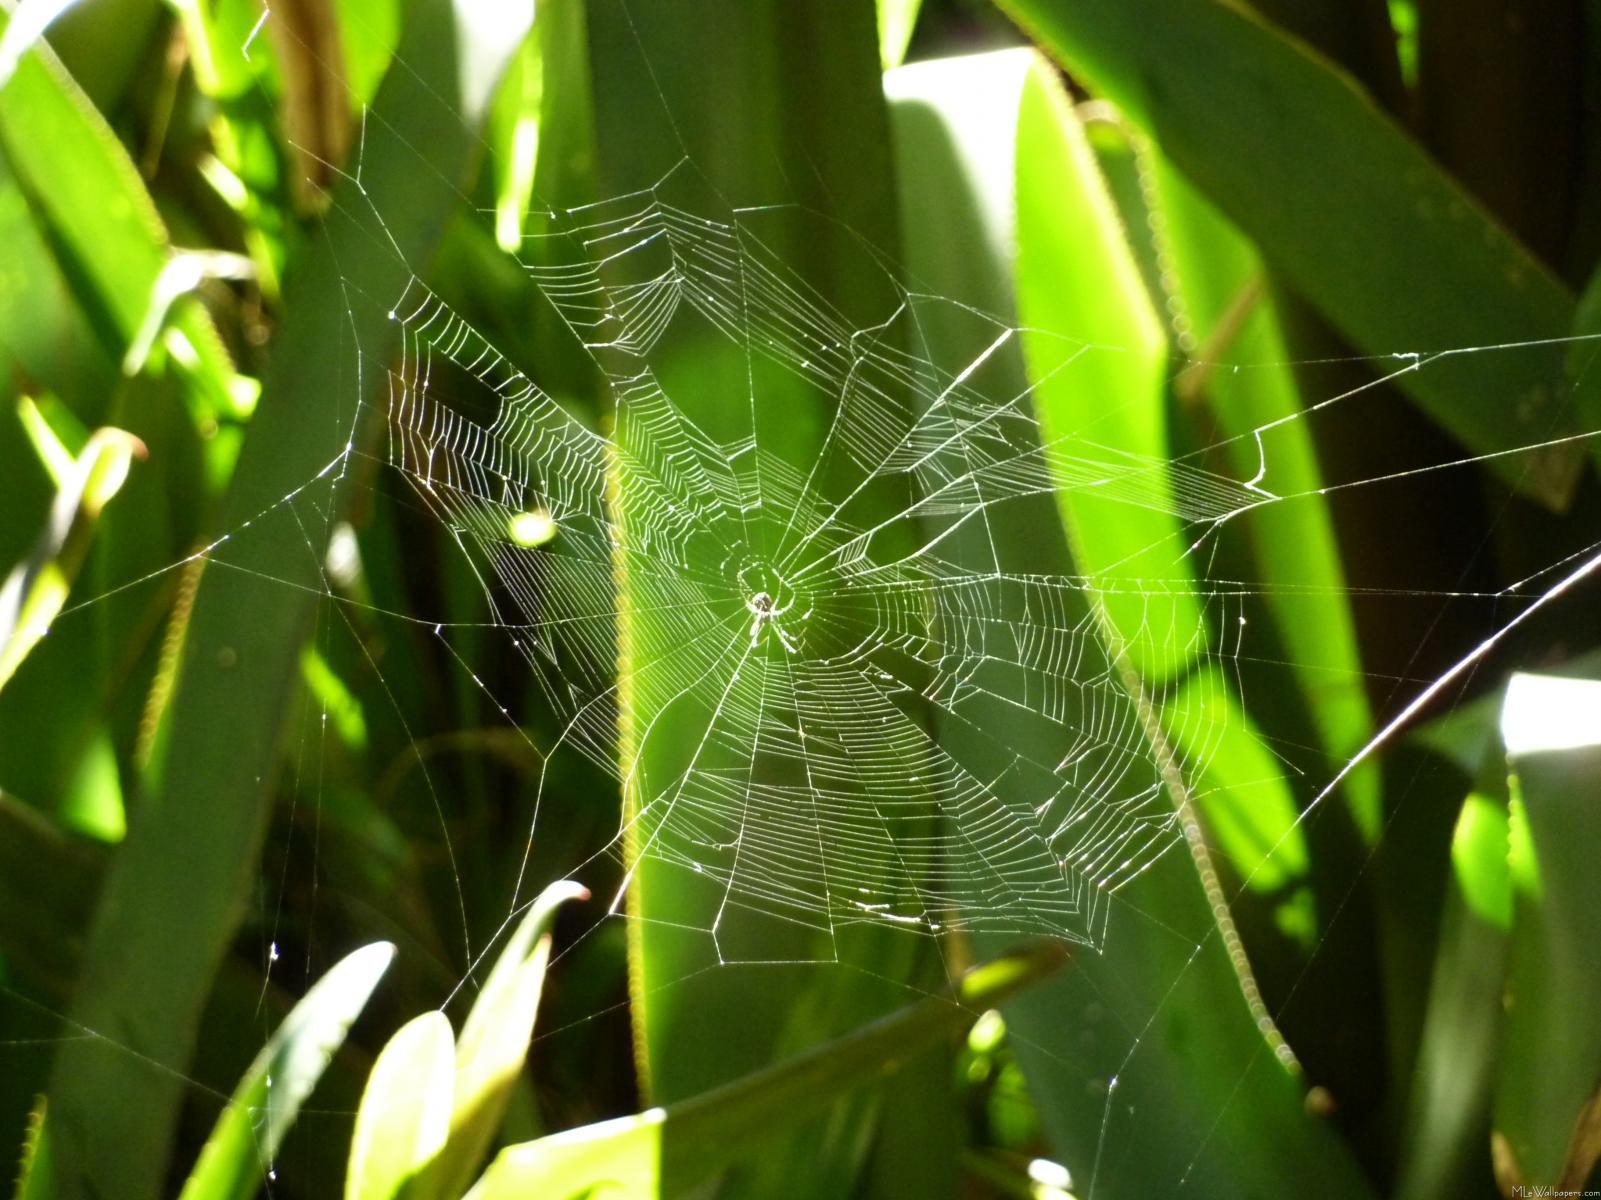 MLeWallpaperscom   Spiderweb in Tropical Leaves 1601x1200